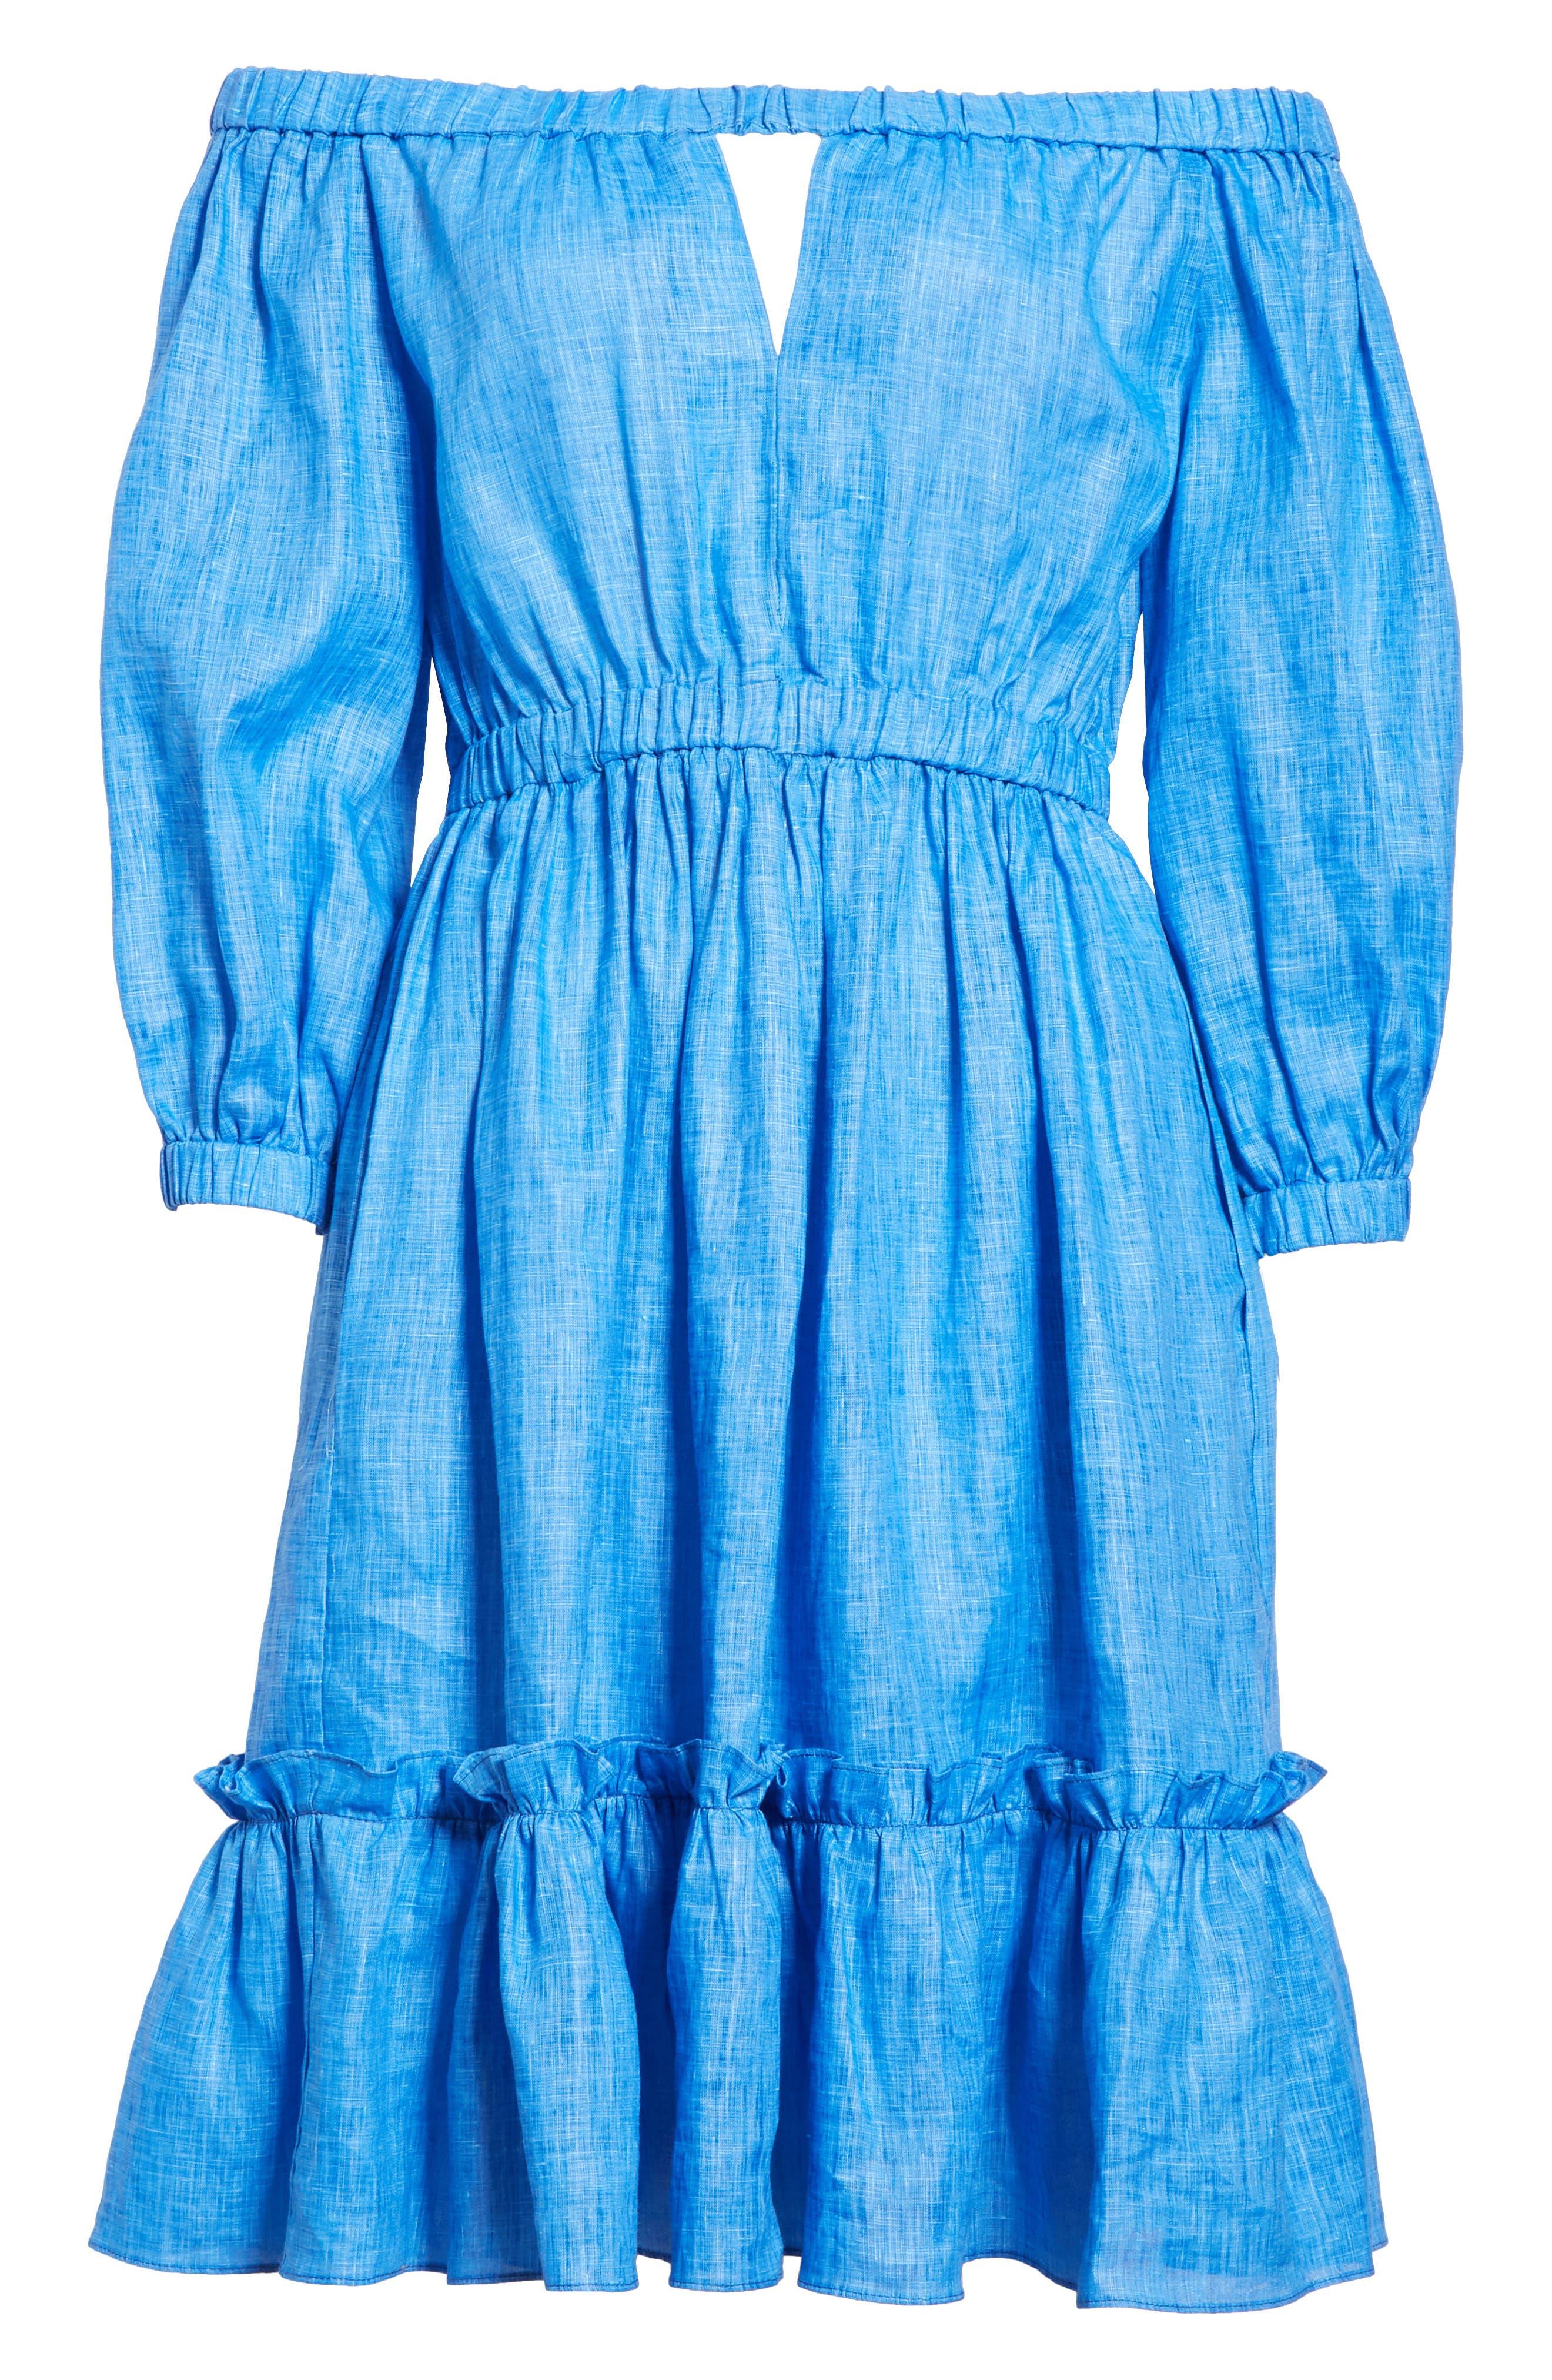 Amanda Off the Shoulder Italian Linen Dress,                             Alternate thumbnail 6, color,                             COBALT